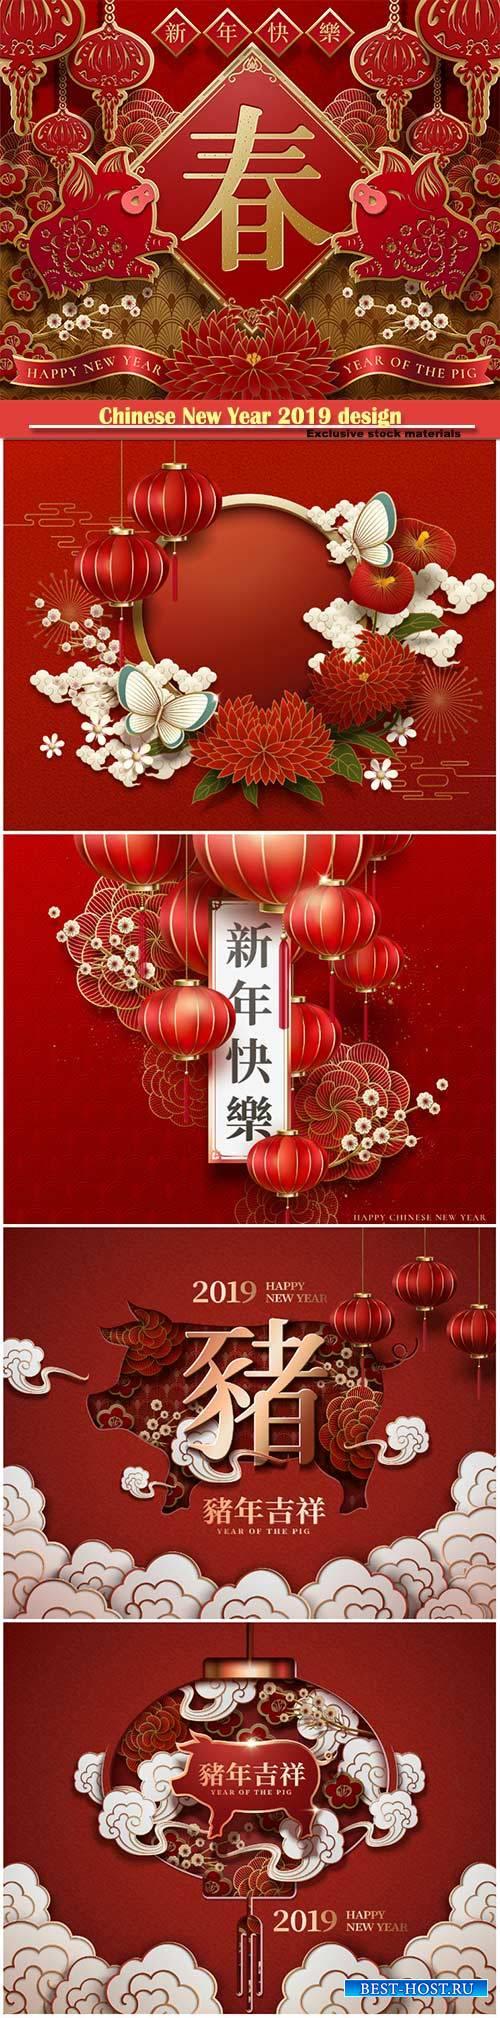 Chinese New Year 2019 festive design vector illustration